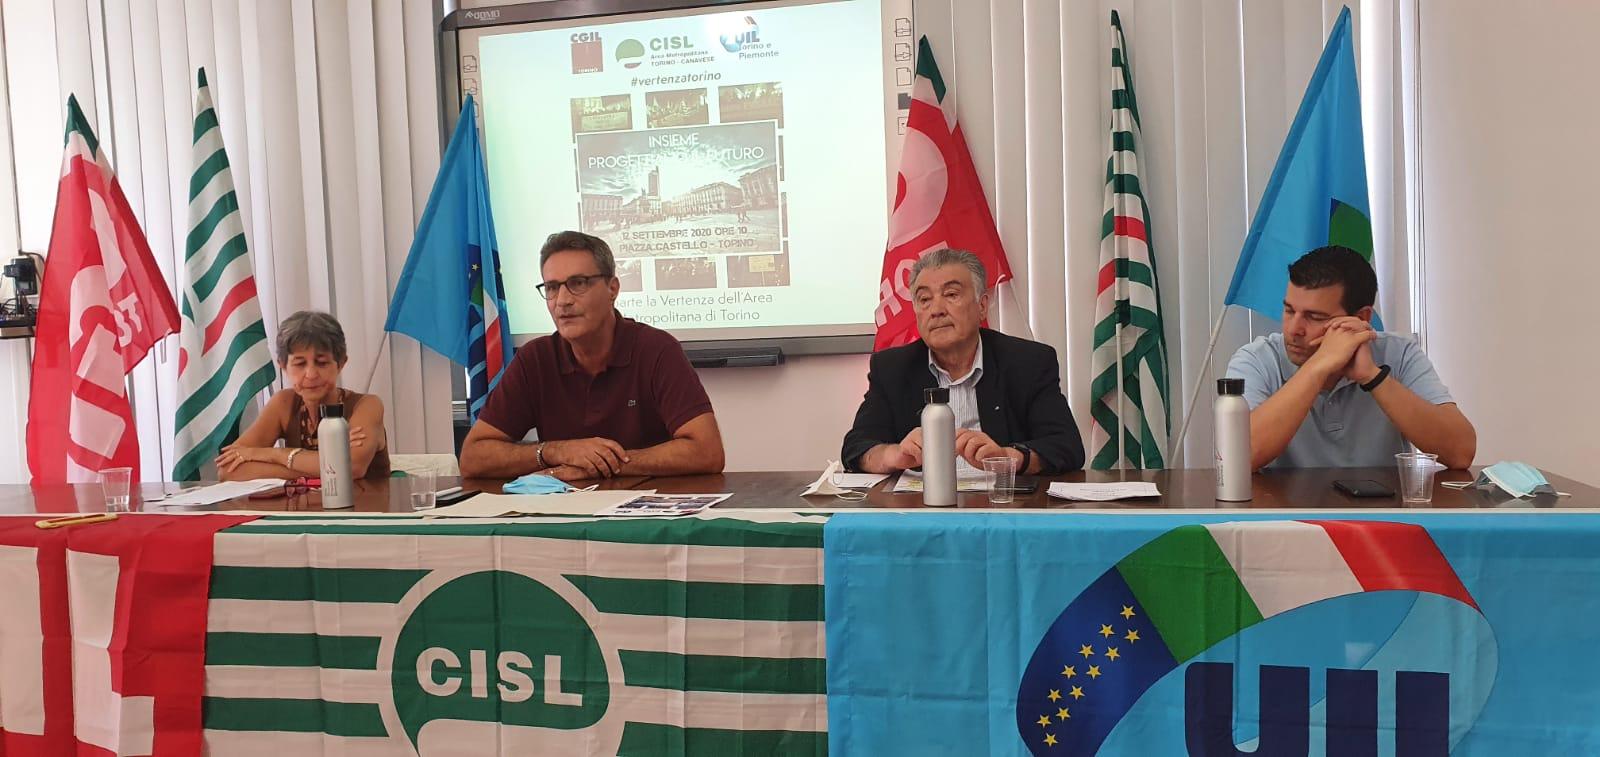 Conferenza stampa Cgil Cisl Uil 31.07.2020